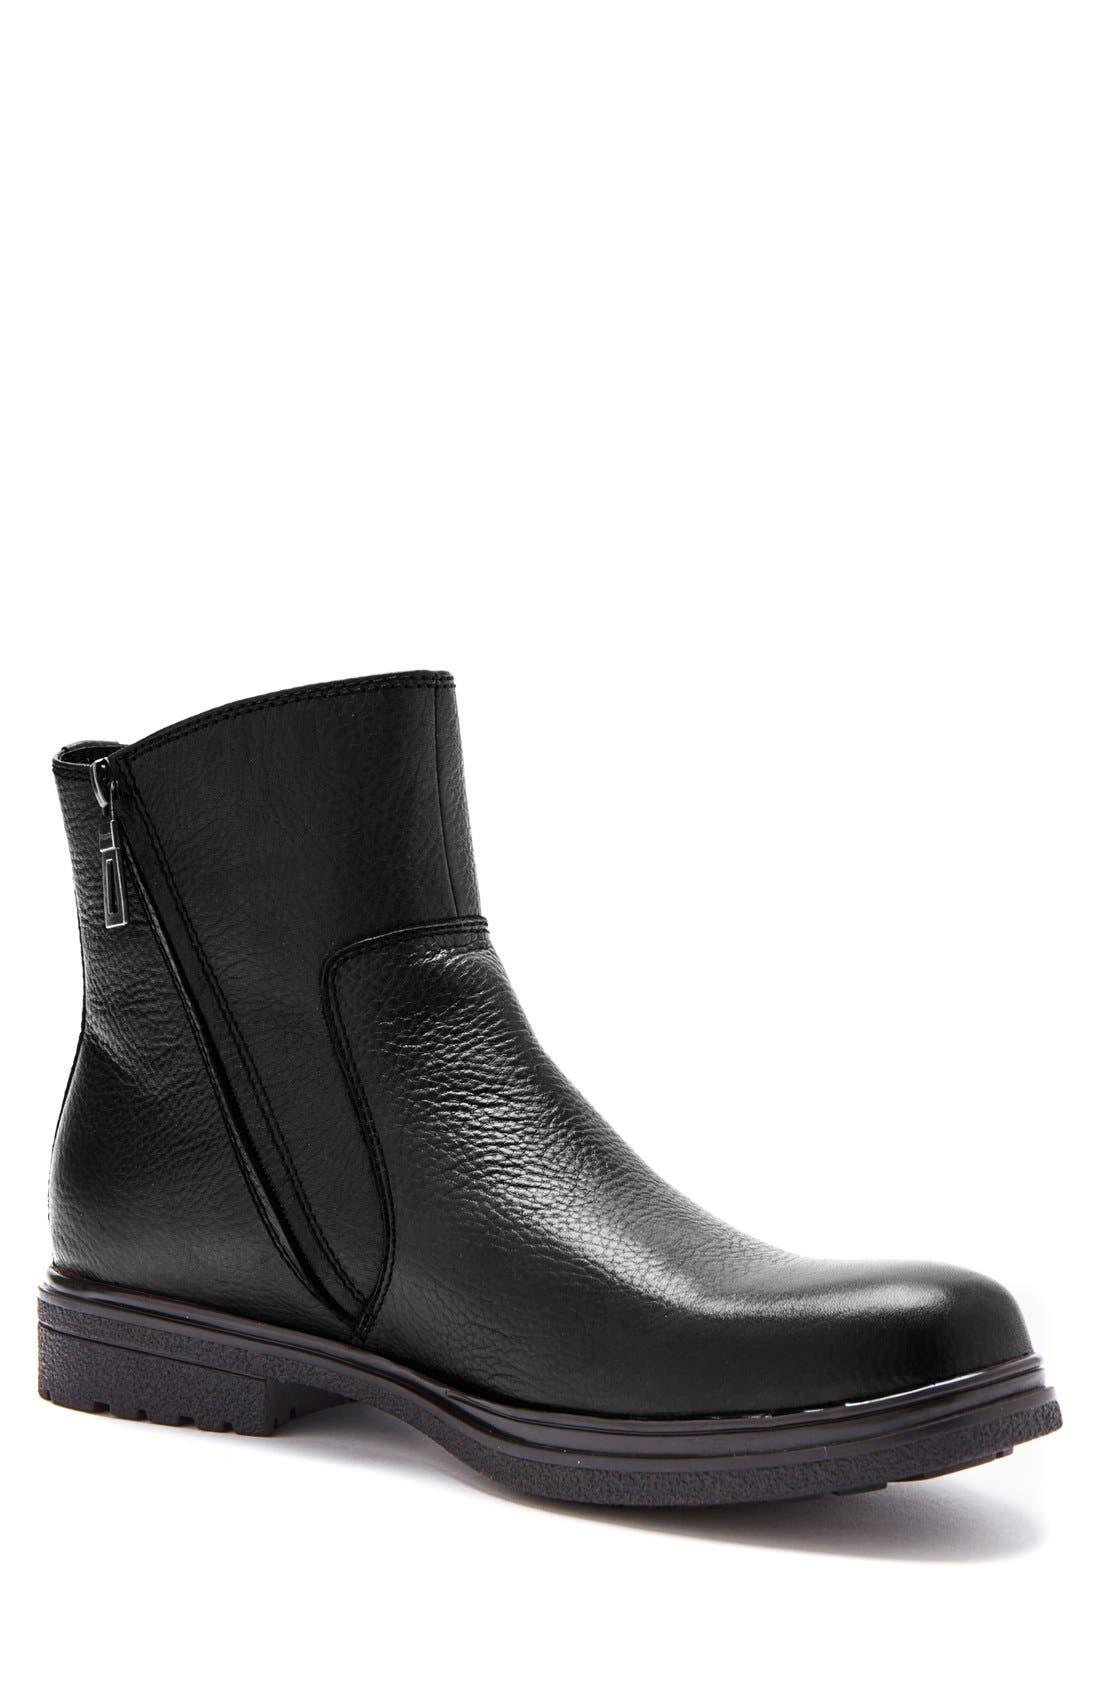 Alternate Image 1 Selected - Blondo 'Brawn' Waterproof Zip Boot (Men)